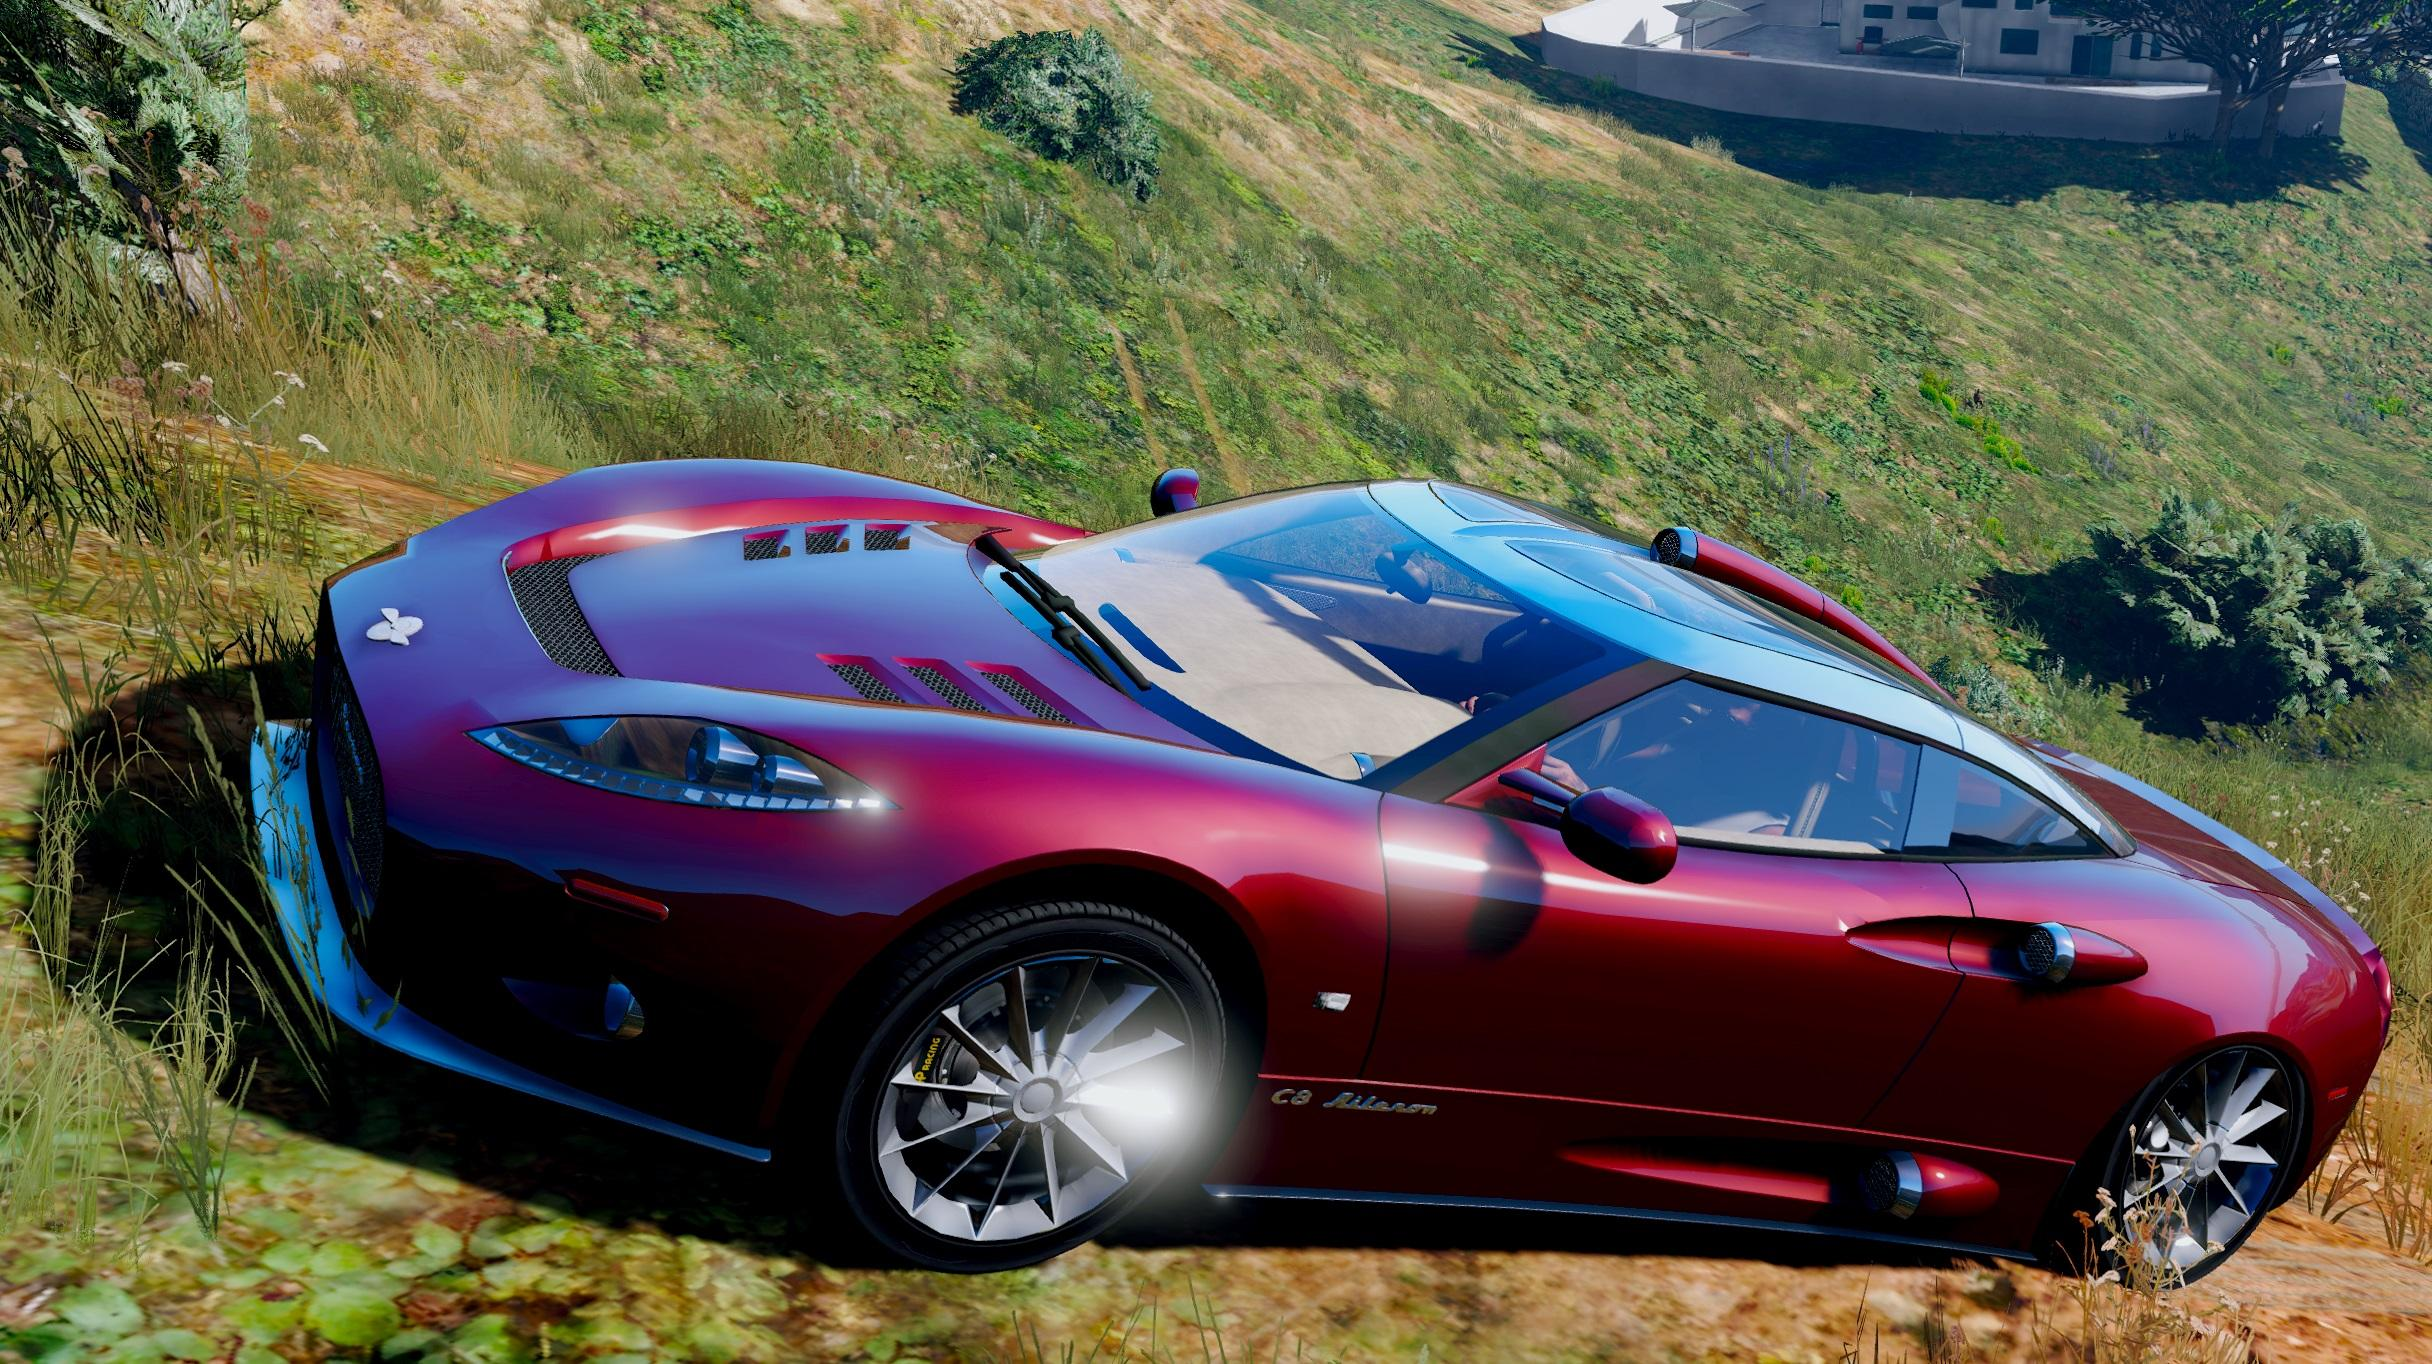 Spyker C8 Aileron Add On Gta5 Mods Com